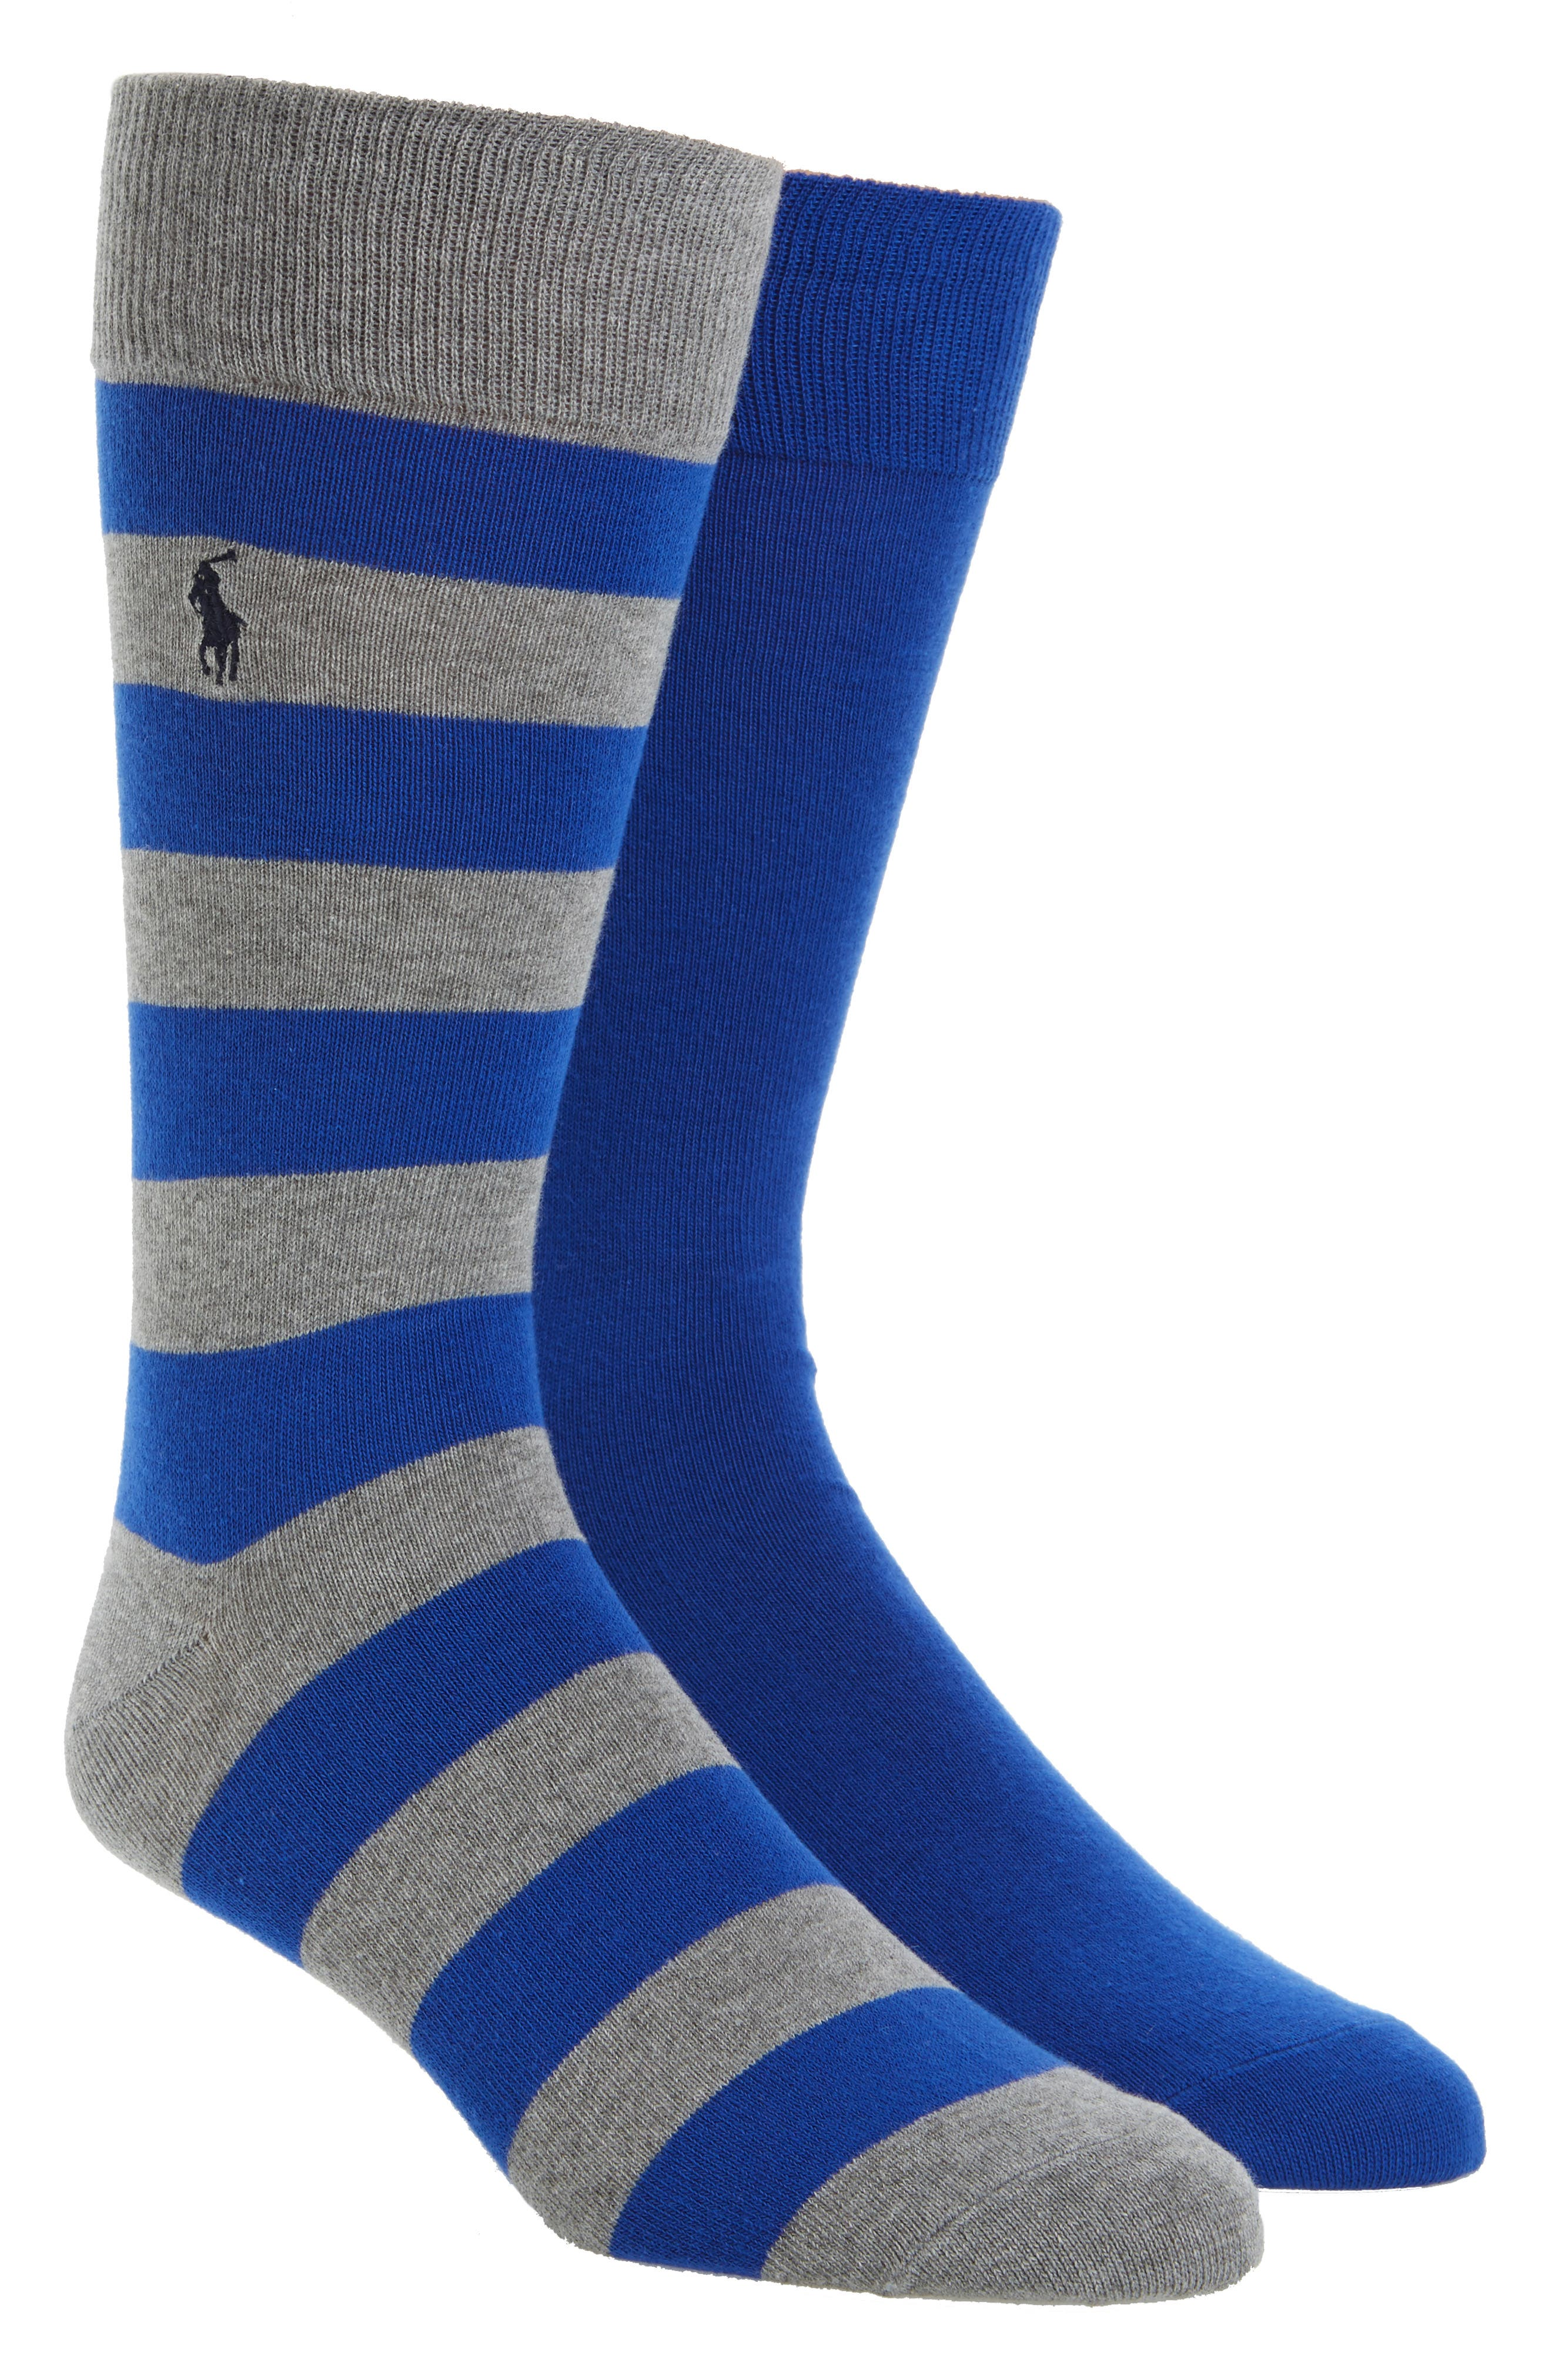 Cotton Blend Socks,                             Alternate thumbnail 23, color,